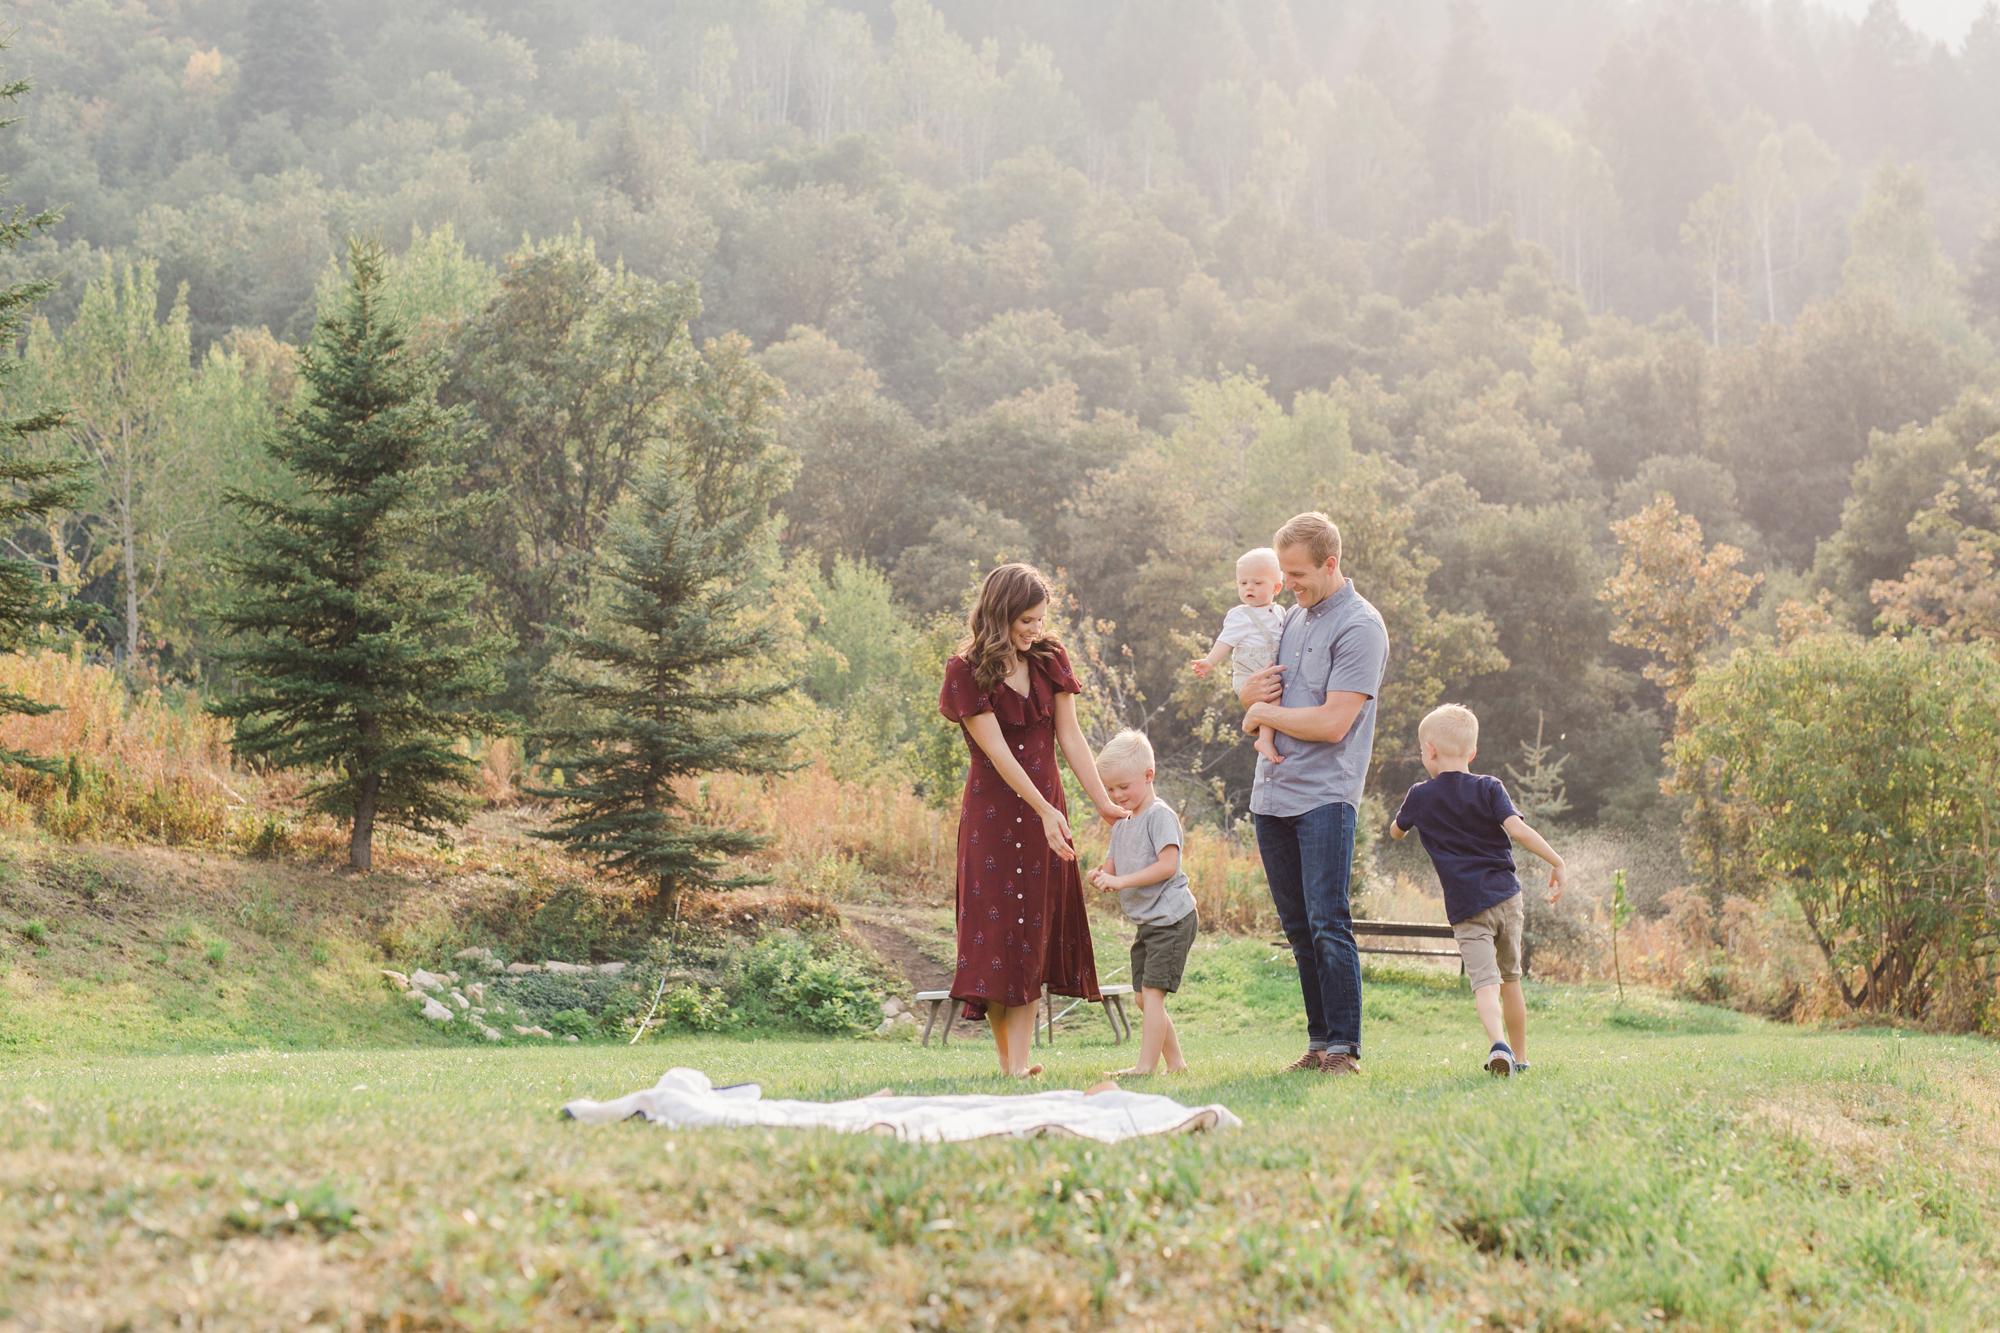 utahfamilyphotography_0004.jpg